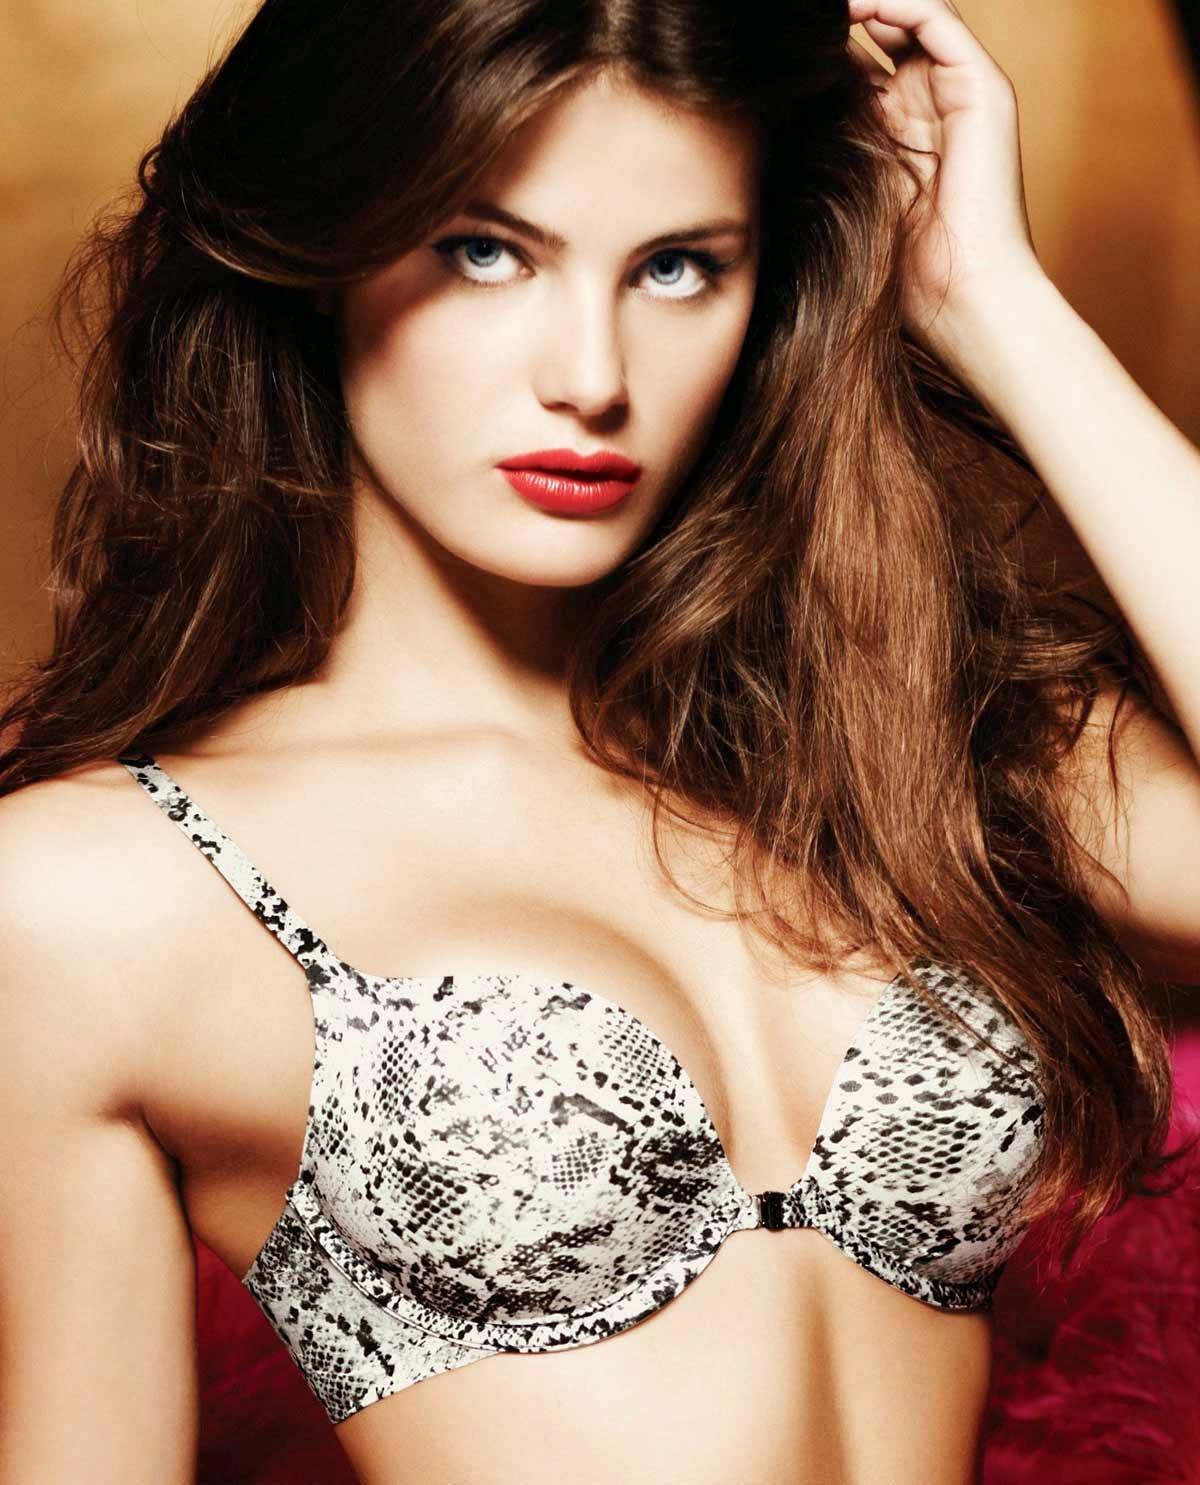 Hd Anushka Shetty Wallpaper Hot And Sexy Isabeli Fontana Hot Wallpapers